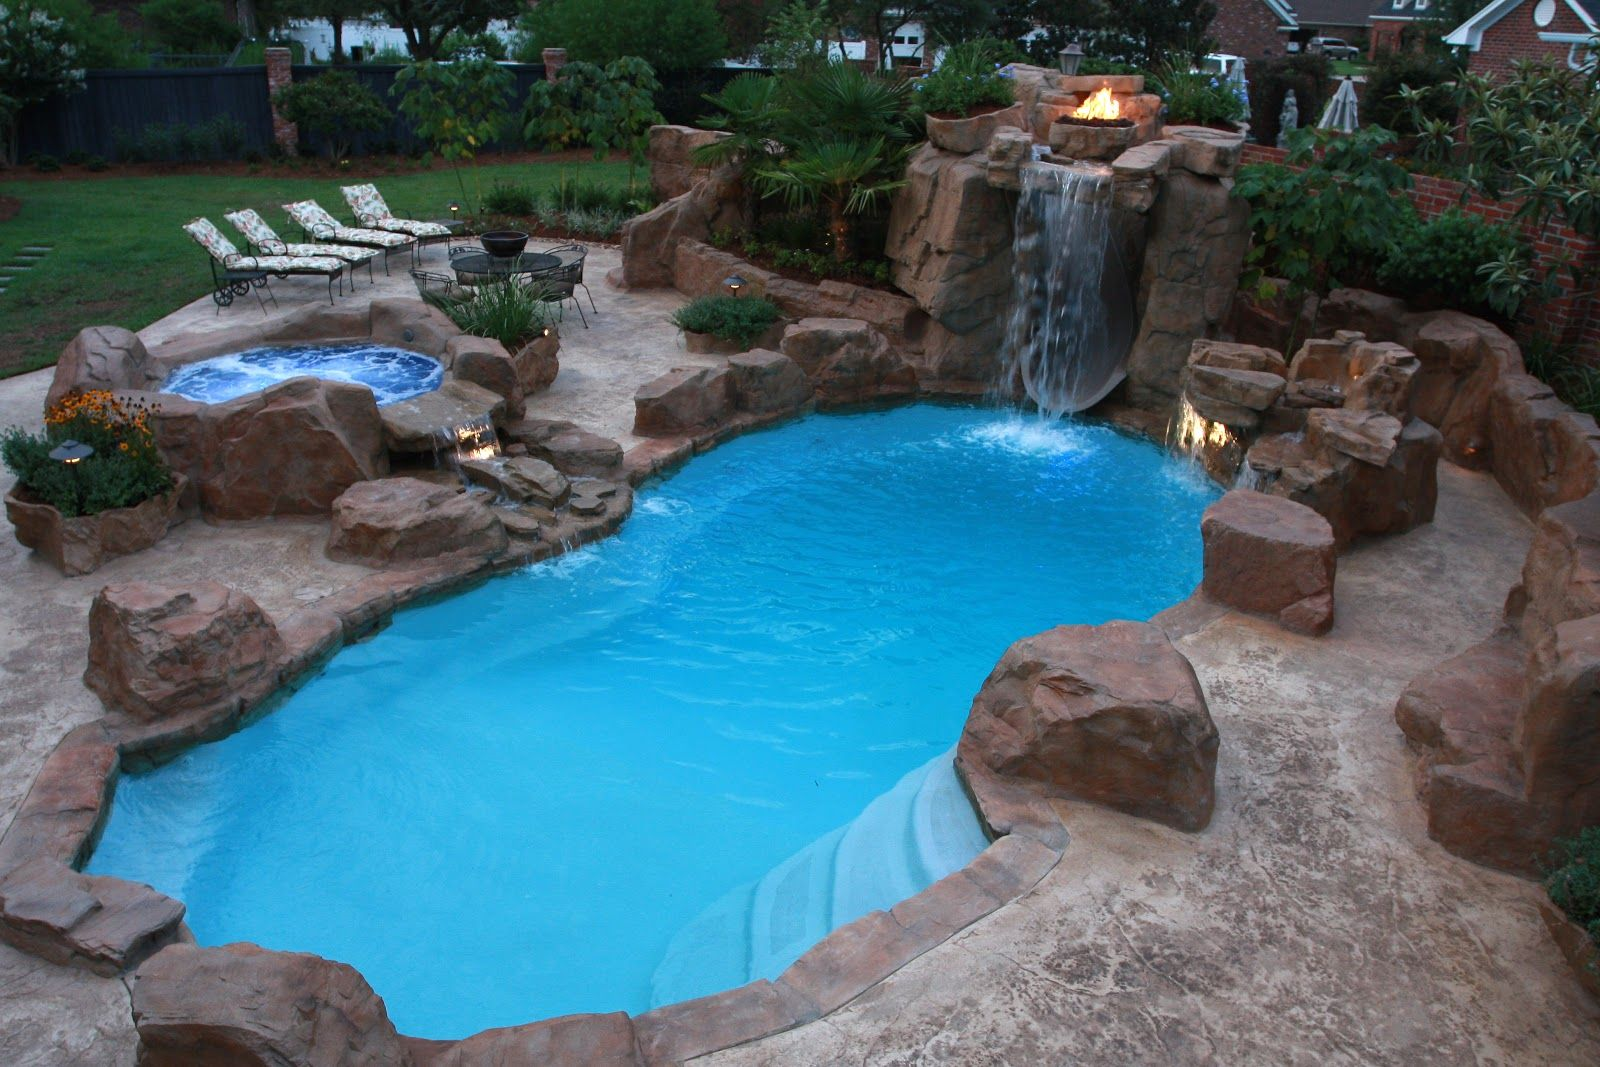 25 Best Ideas For Backyard Pools Backyard Pool Cost Swimming Pool Designs Swimming Pools Backyard Landscape